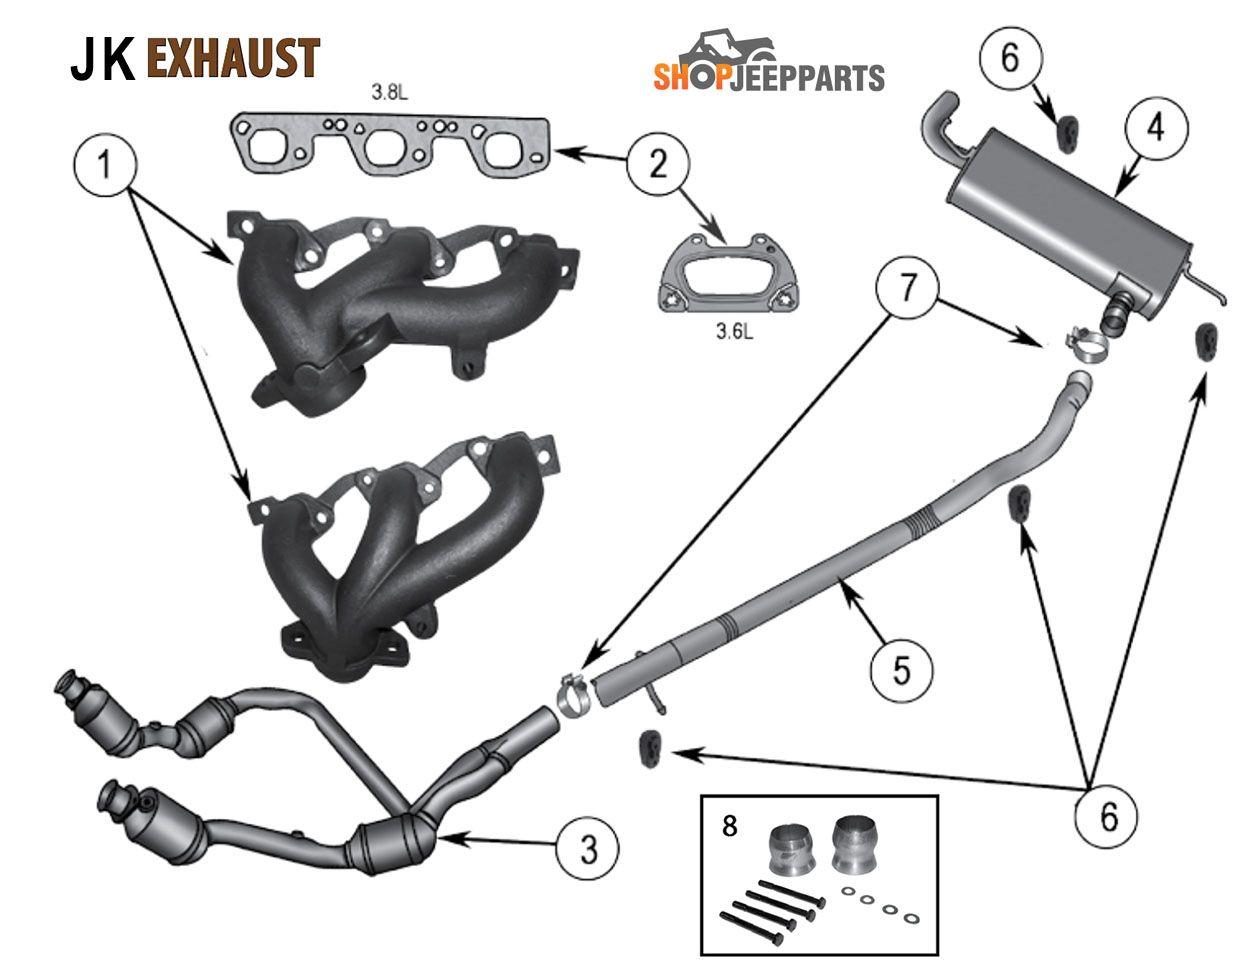 Jeep Jk Wrangler Exhaust Parts Diagram Wrangler Jk Jeep Jk Wrangler